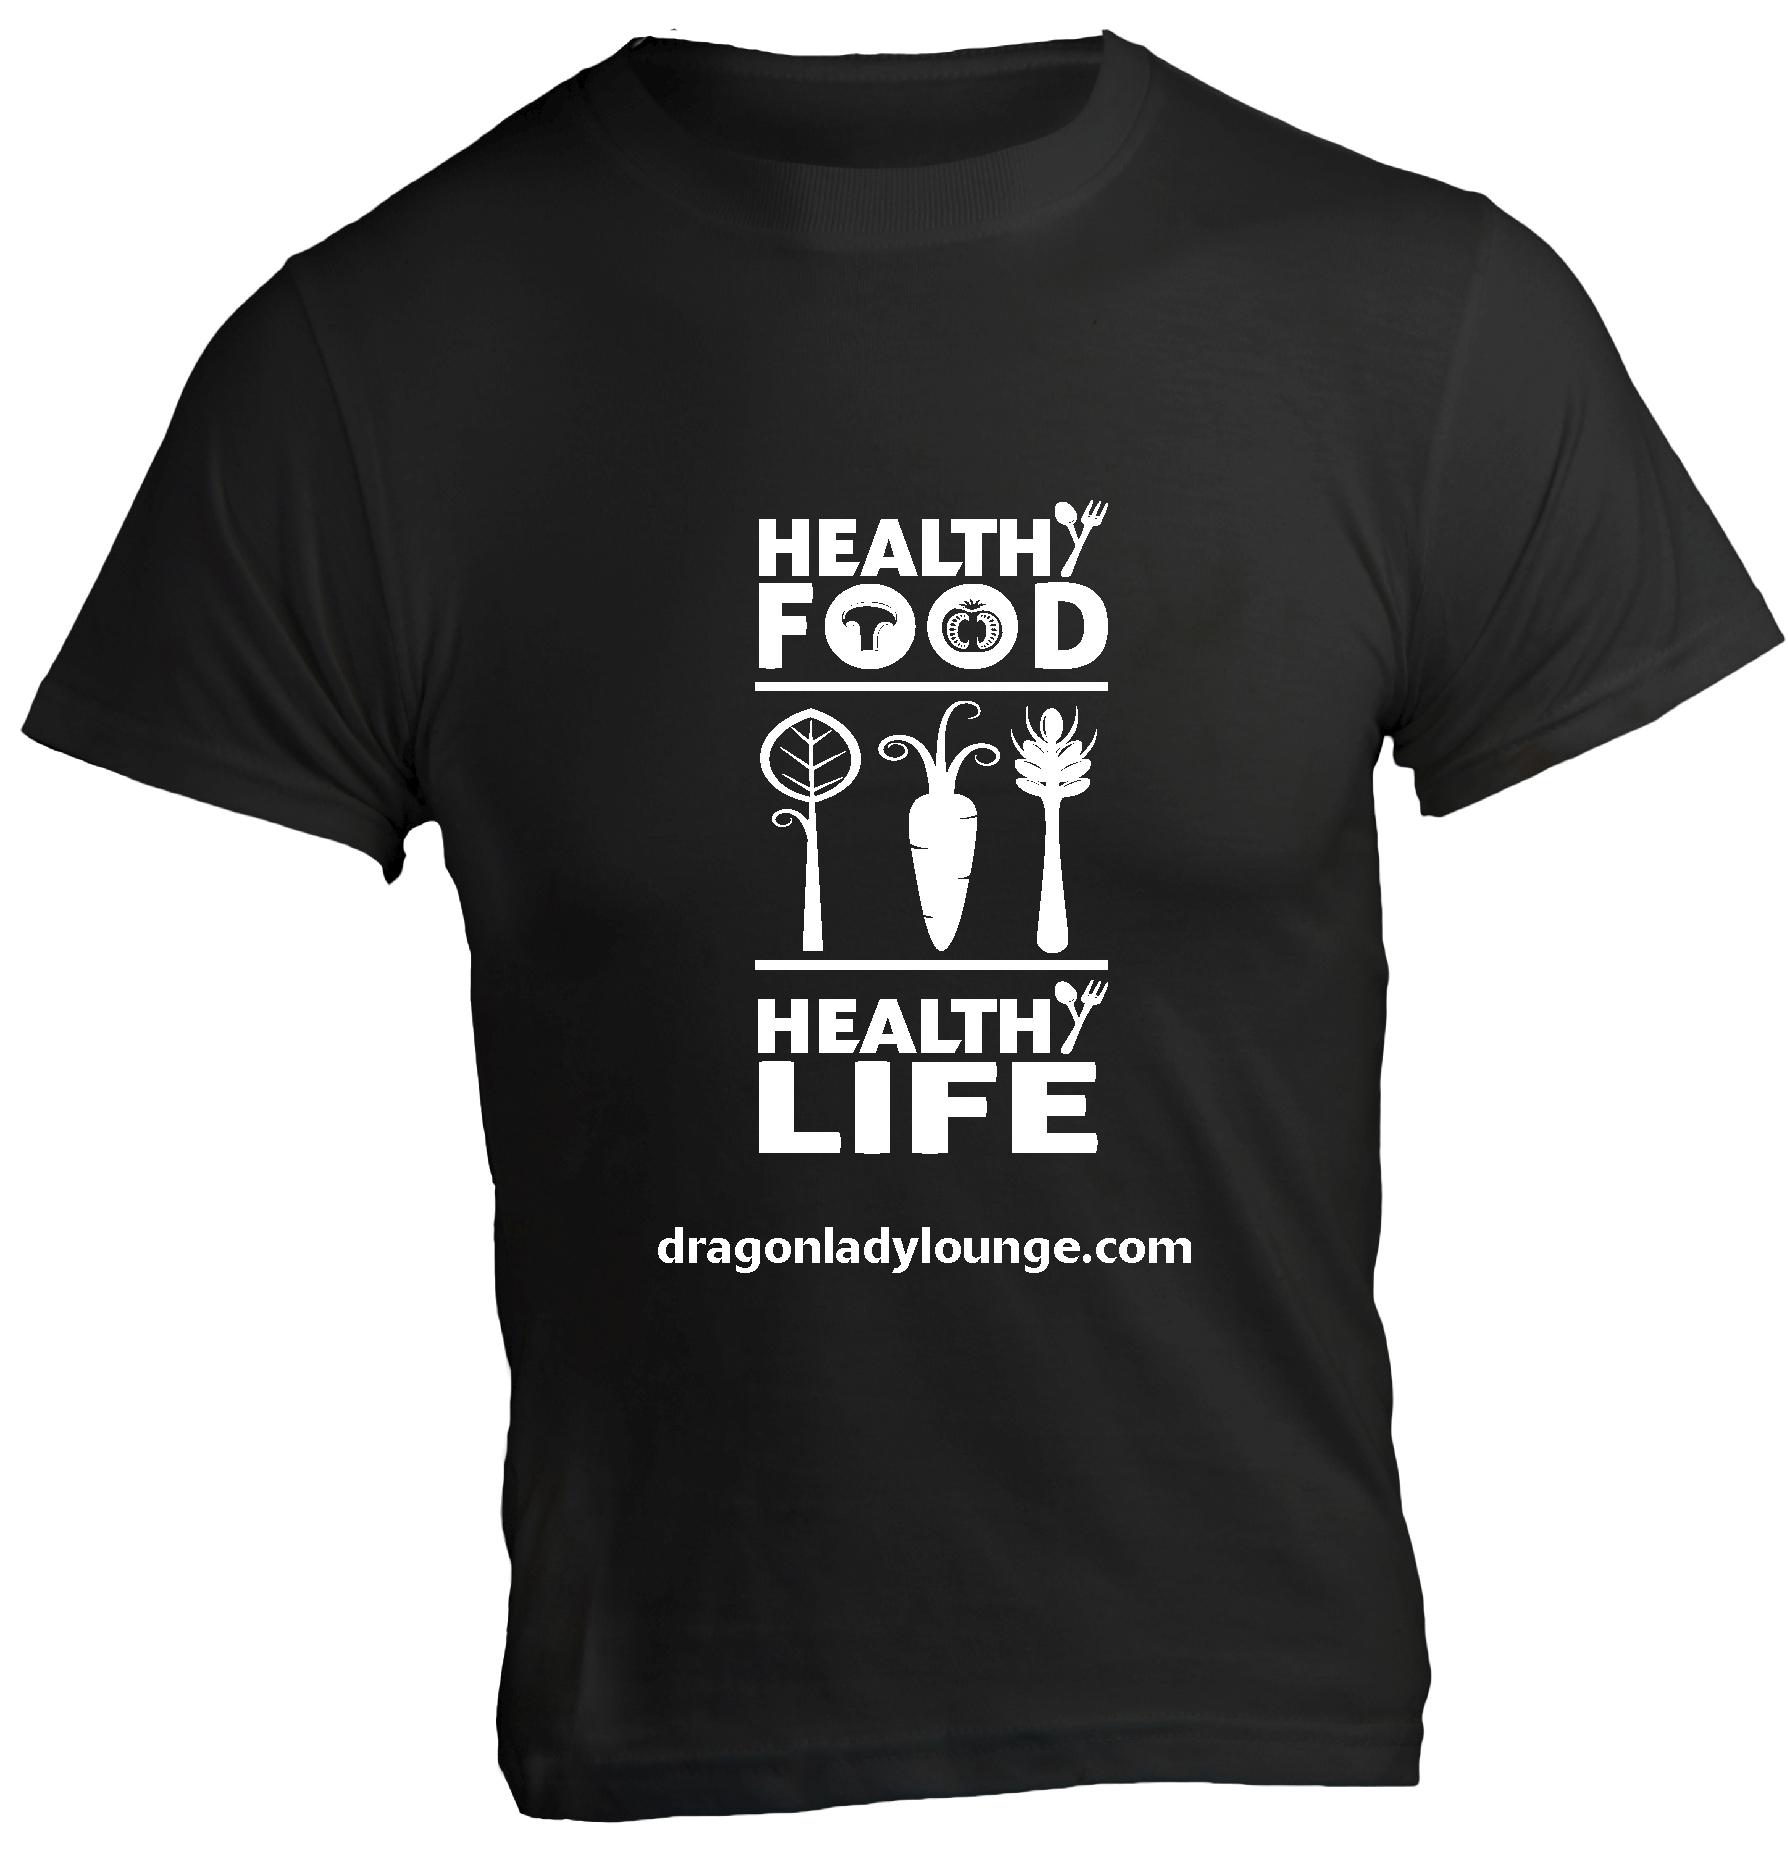 Healthy Food Life Shirt BW